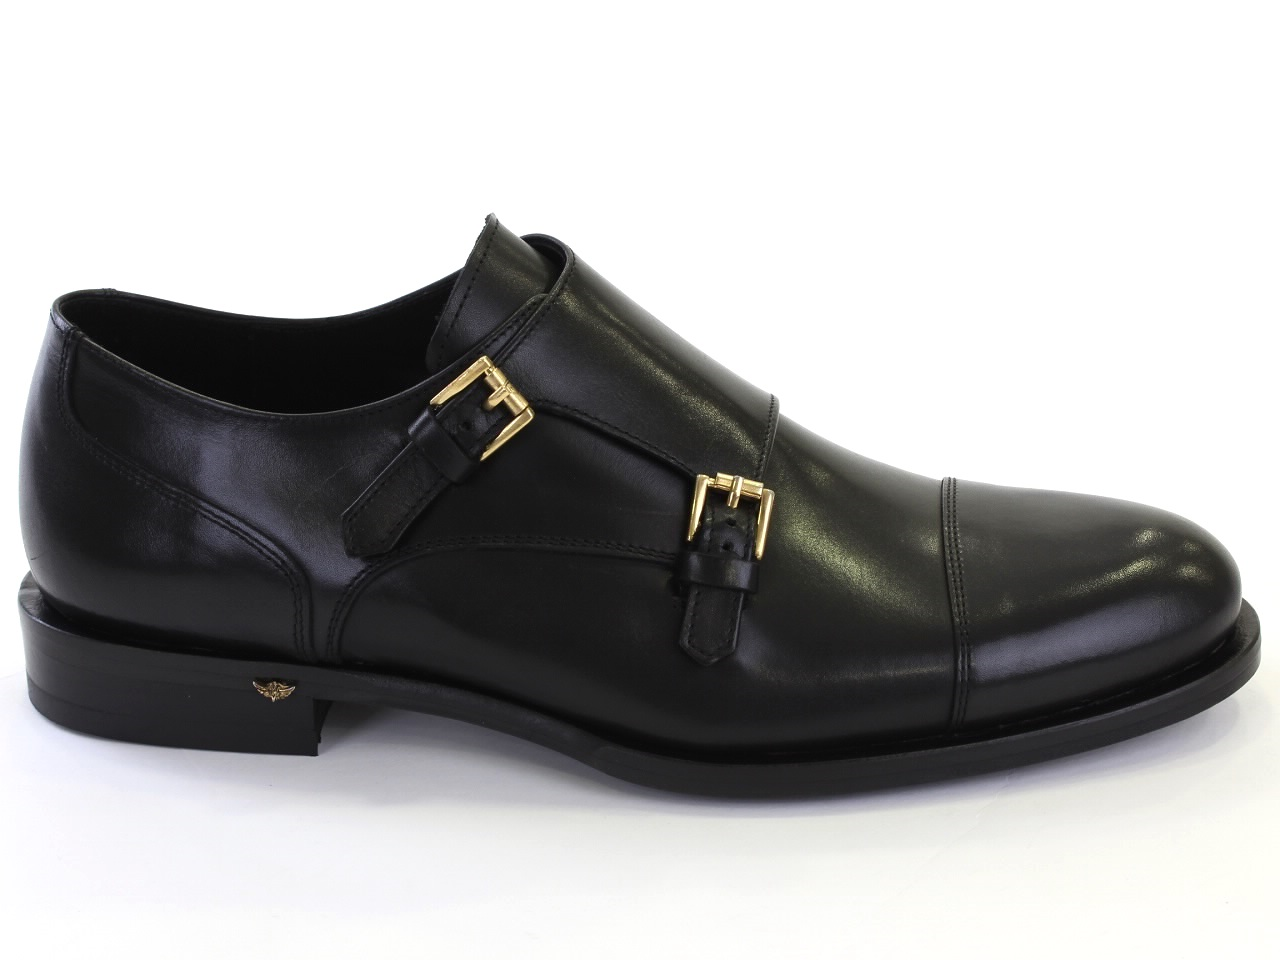 Slip-on Shoes Miguel Vieira - 233 MV5064